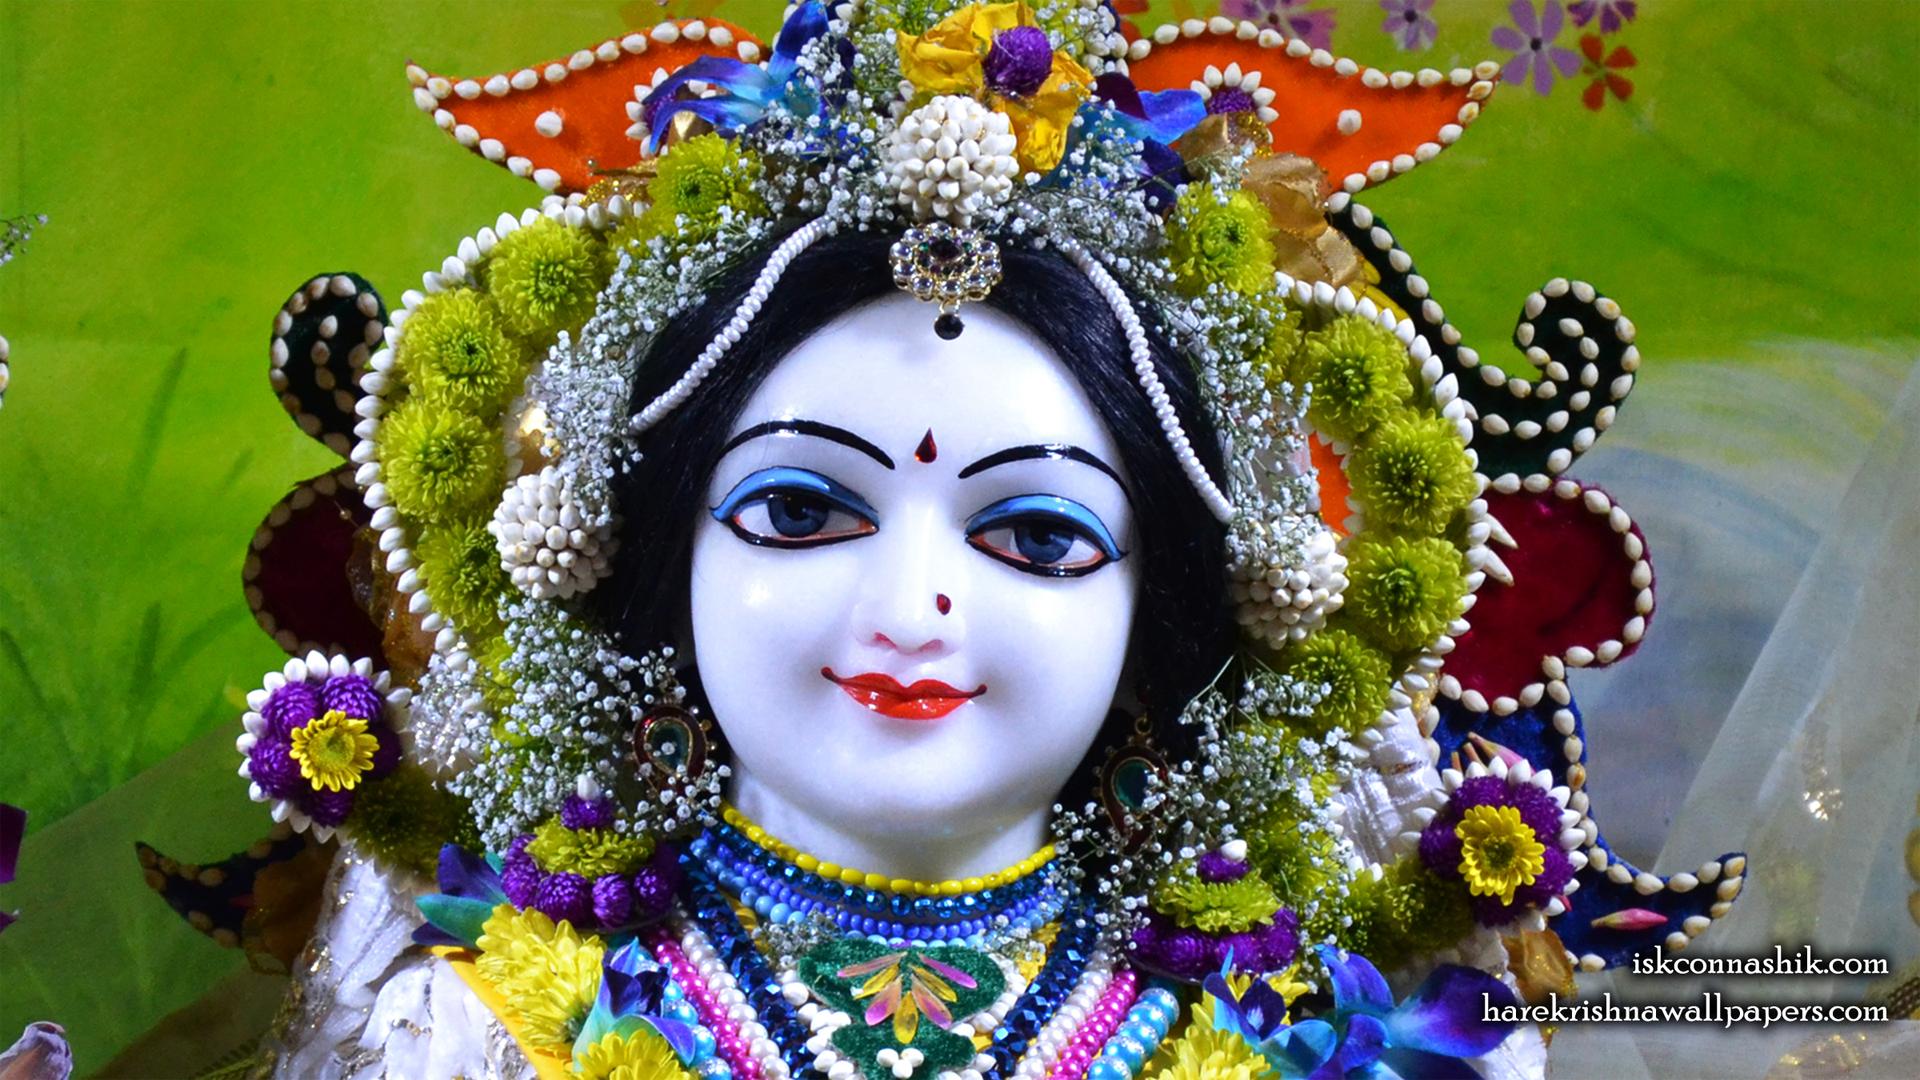 Sri Radha Close up Wallpaper (009) Size 1920x1080 Download